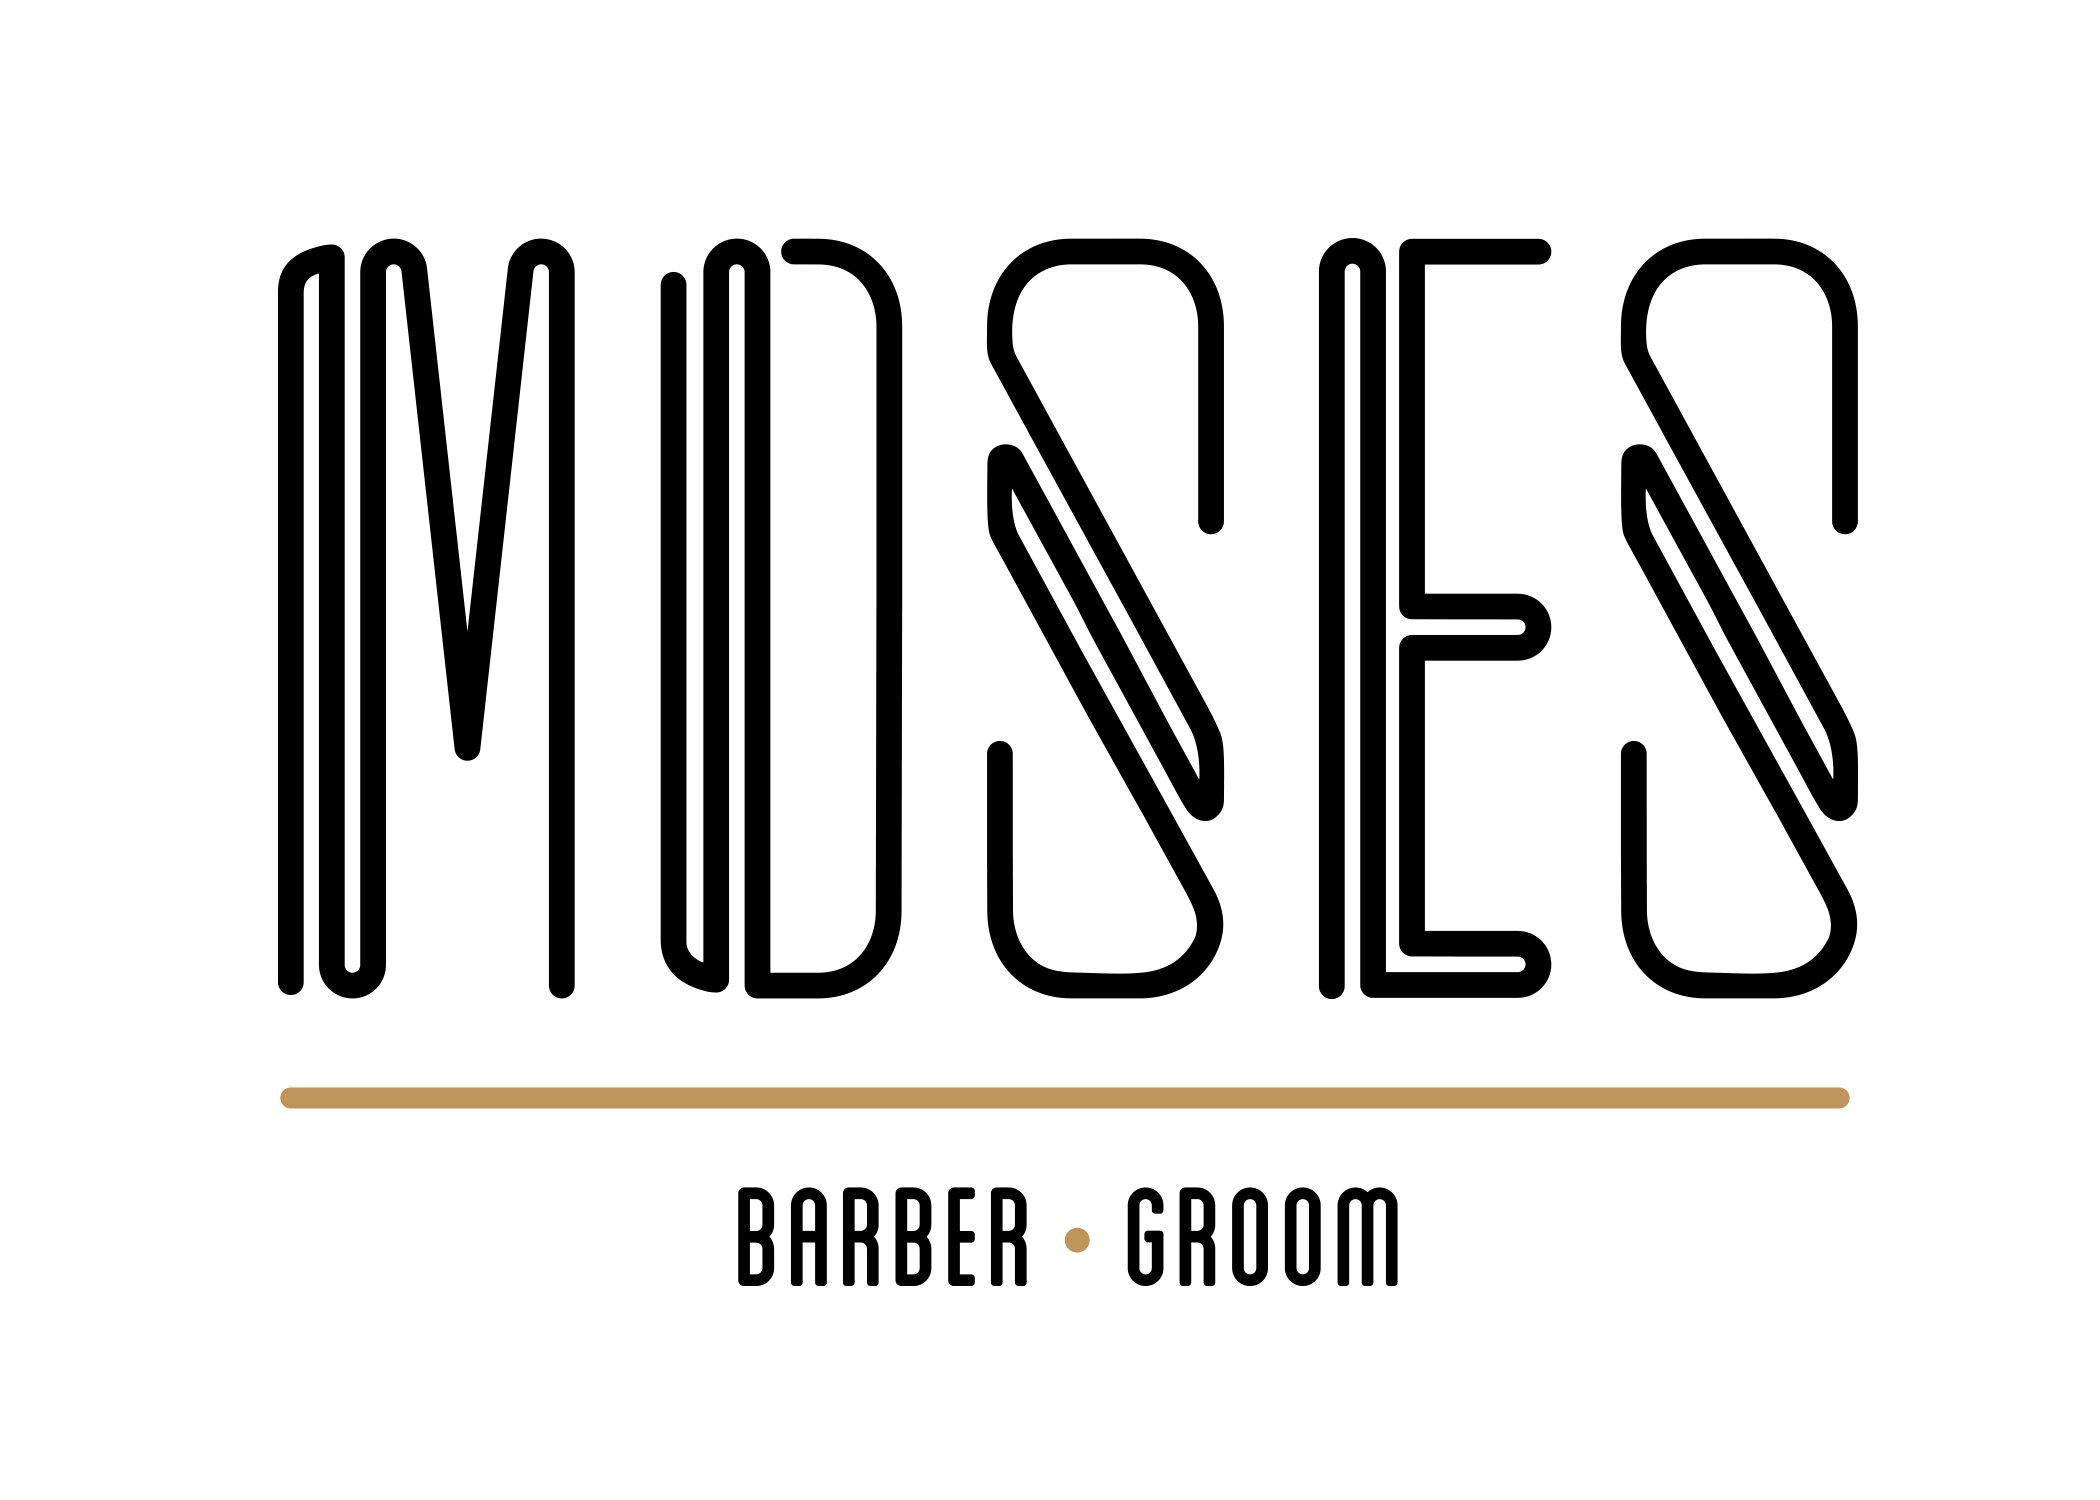 MOSES BARBER & GROOM - 2019